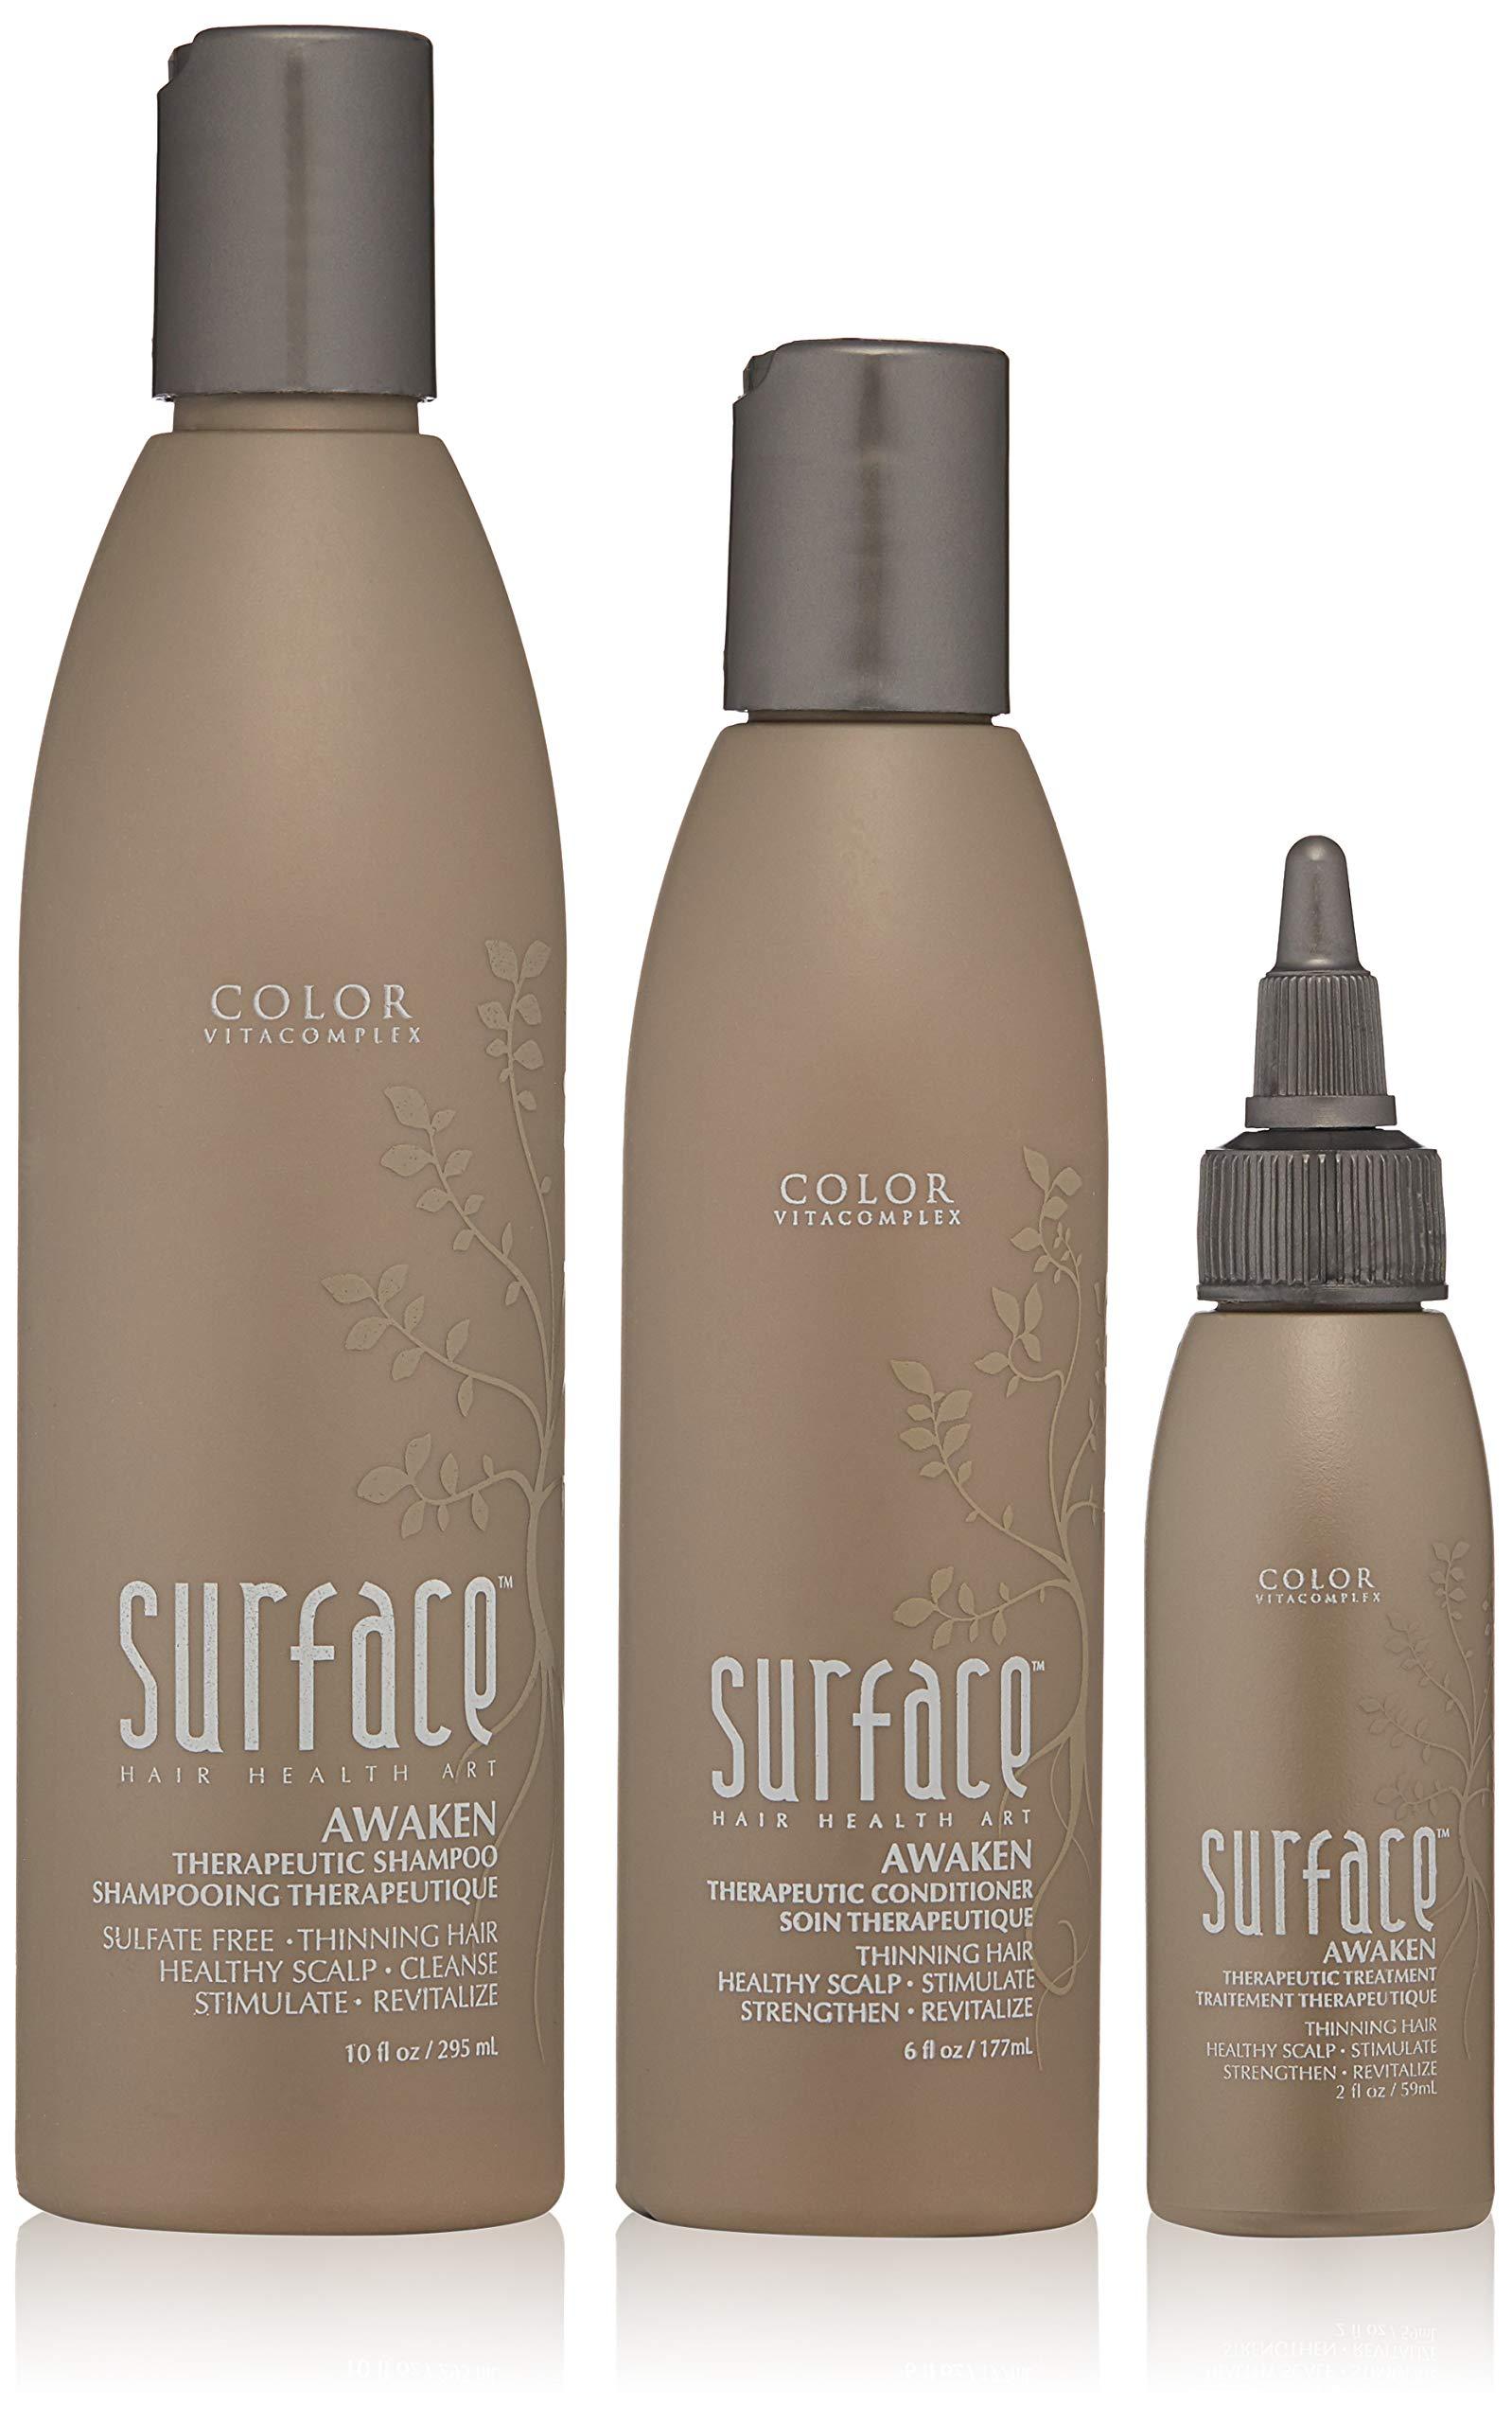 Surface AWAKEN trio Therapeutic Shampoo 10 fl oz Therapeutic Conditioner 6 oz Awaken Therapeutic Treatment 2 fl oz. by Surface Hair